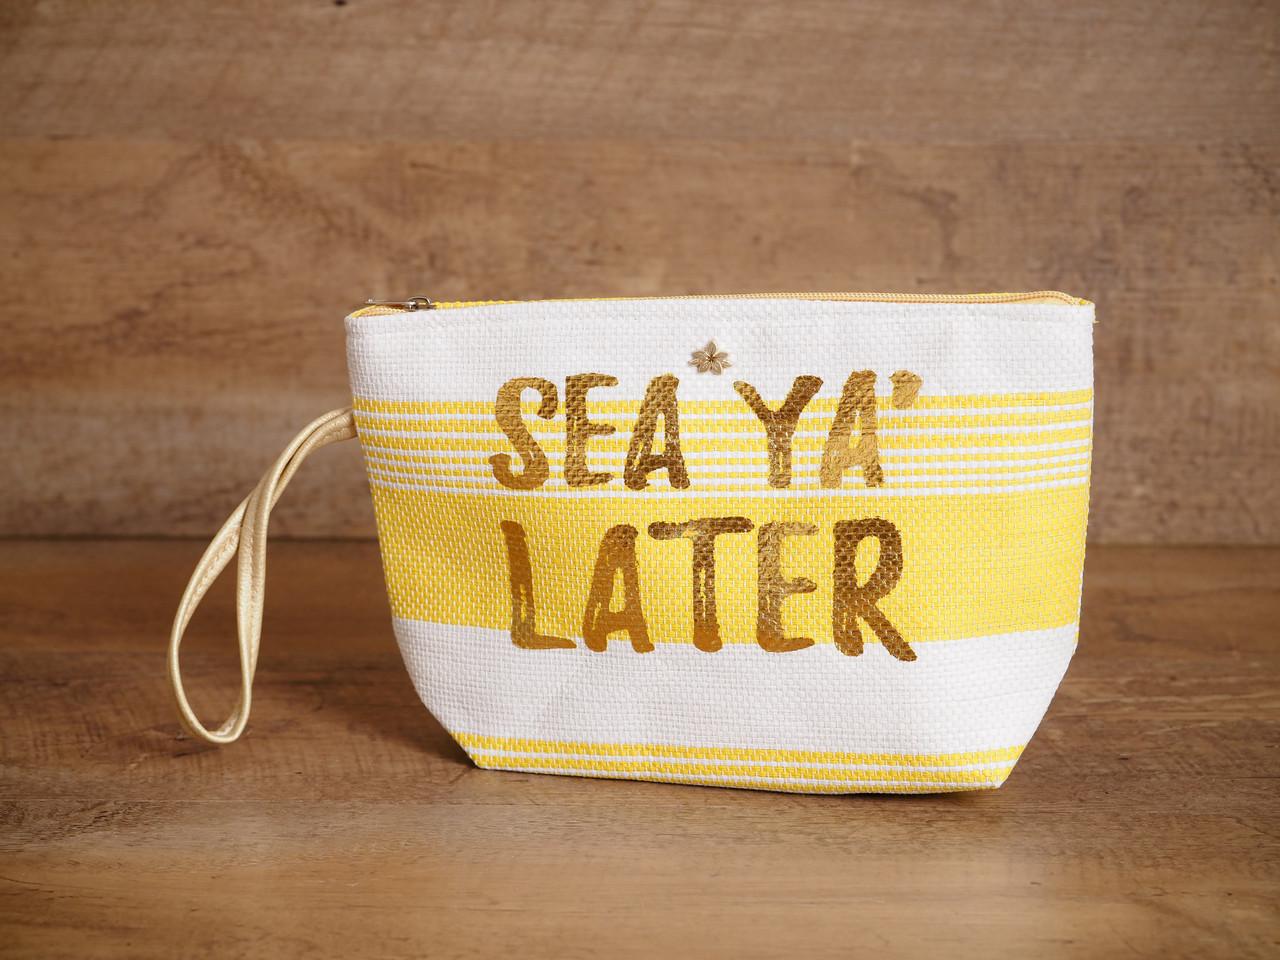 Straw Wristlet - 'Sea Ya' Later'